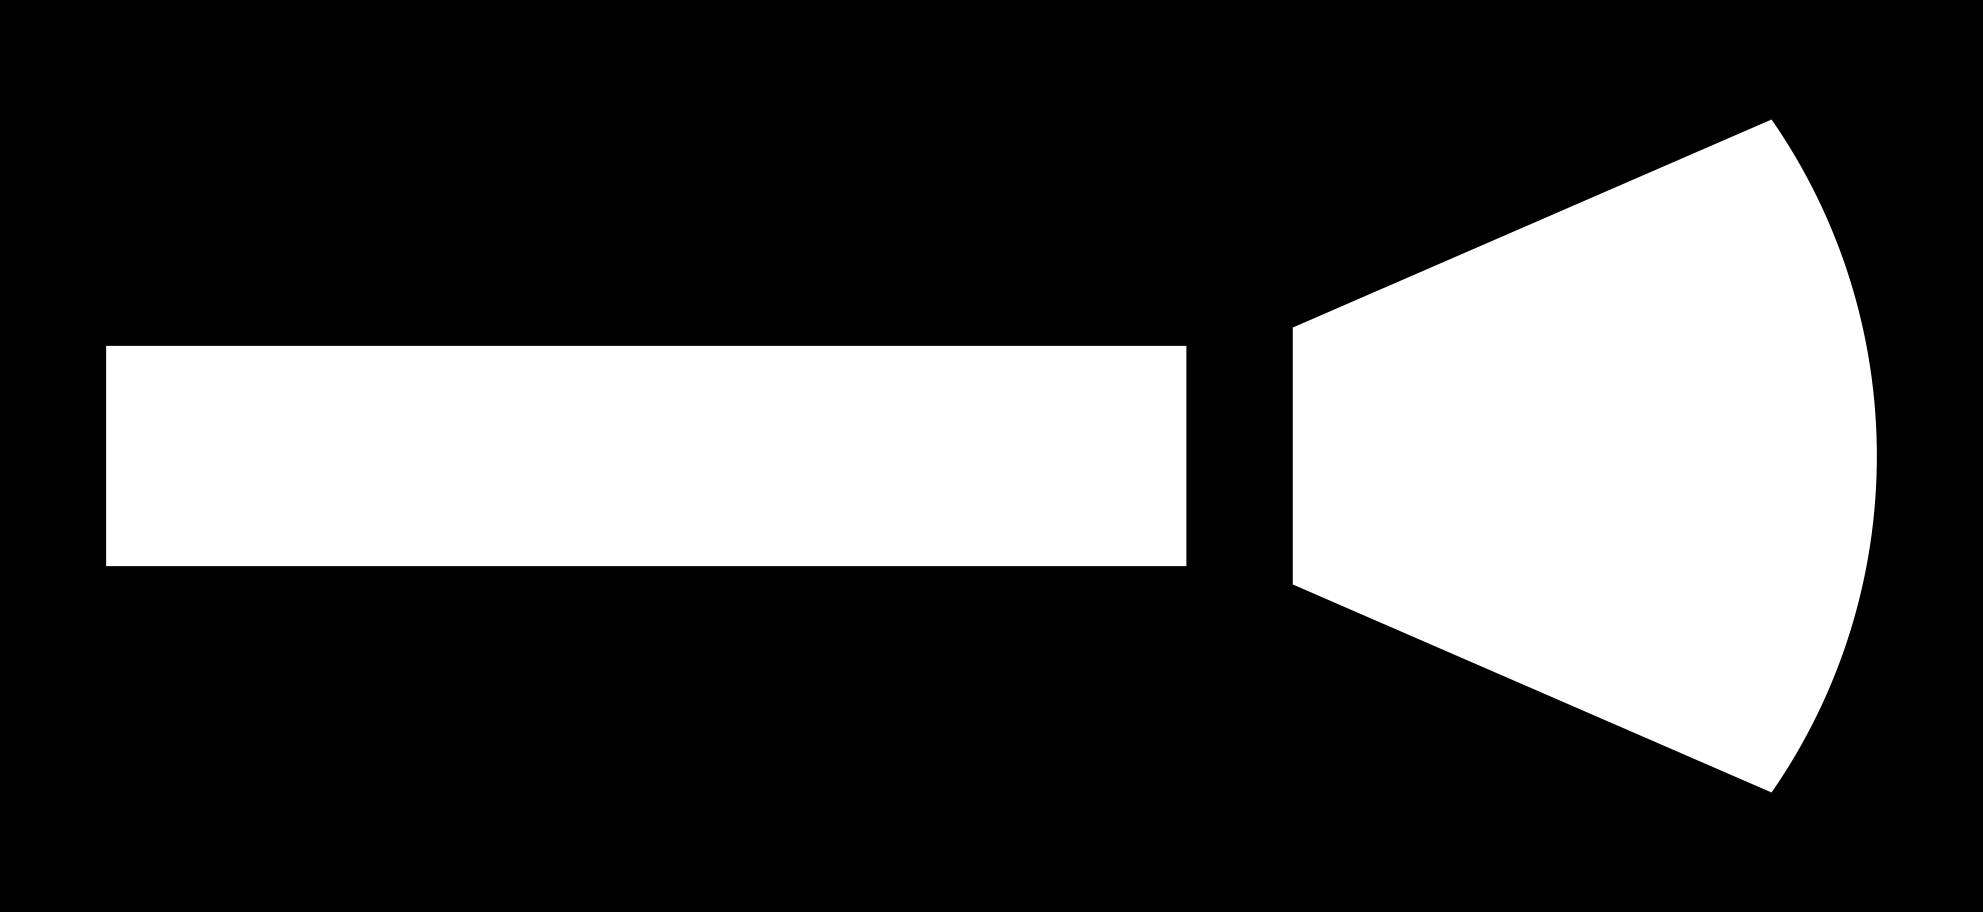 virtual glasses Clipart illustration in PNG, SVG